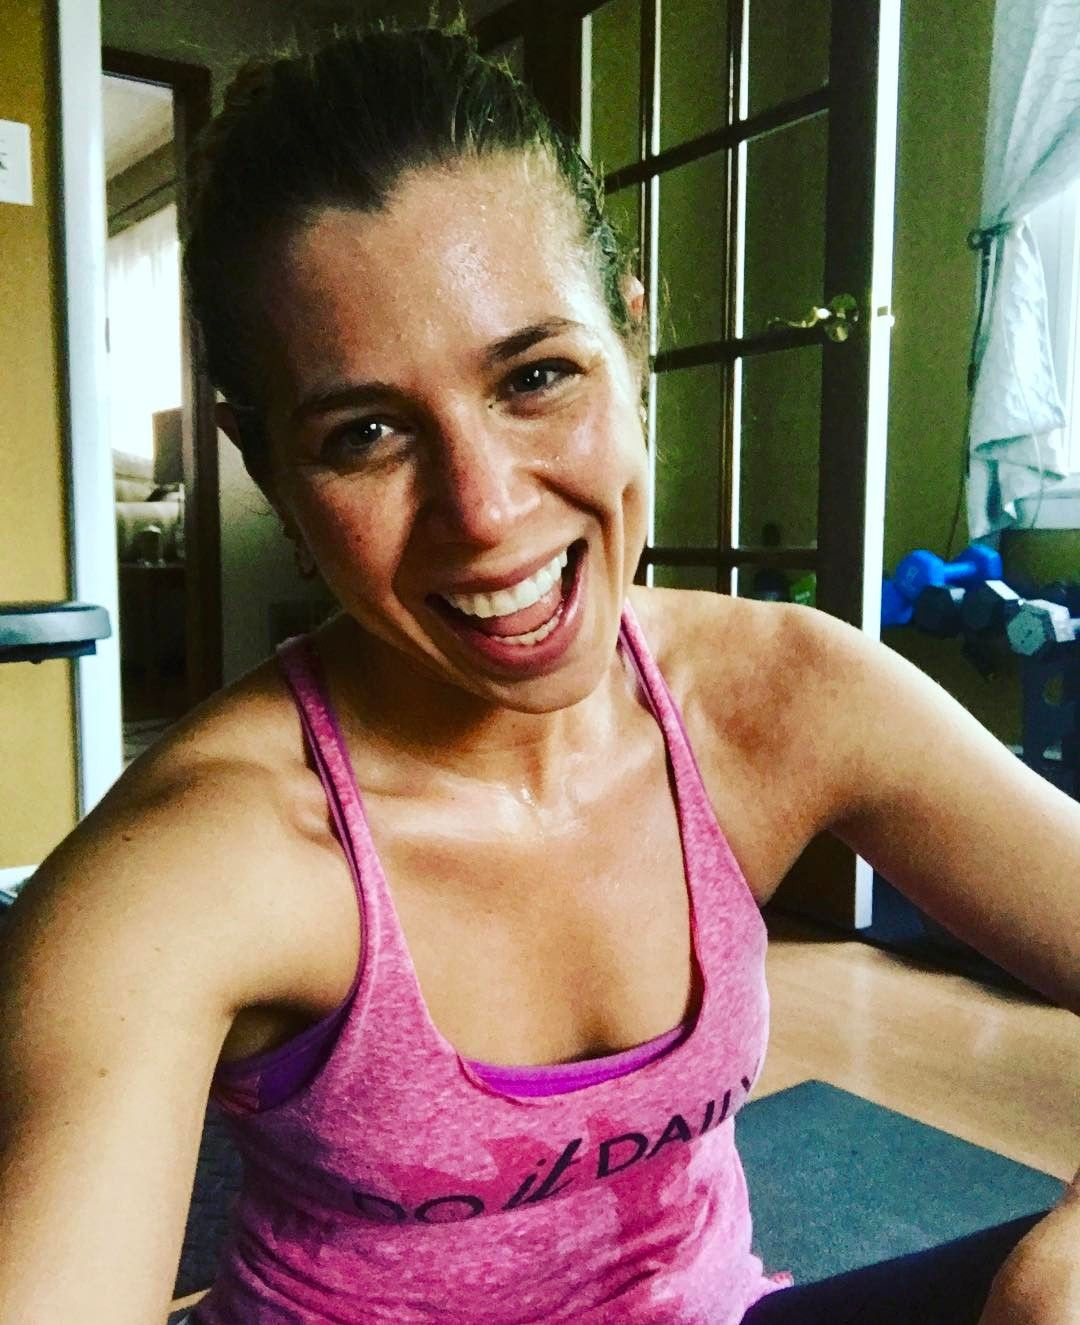 Somedays it's not about health or building muscle; it's #therapy A veces no es por salud o sacar músculo; es mi #terapia